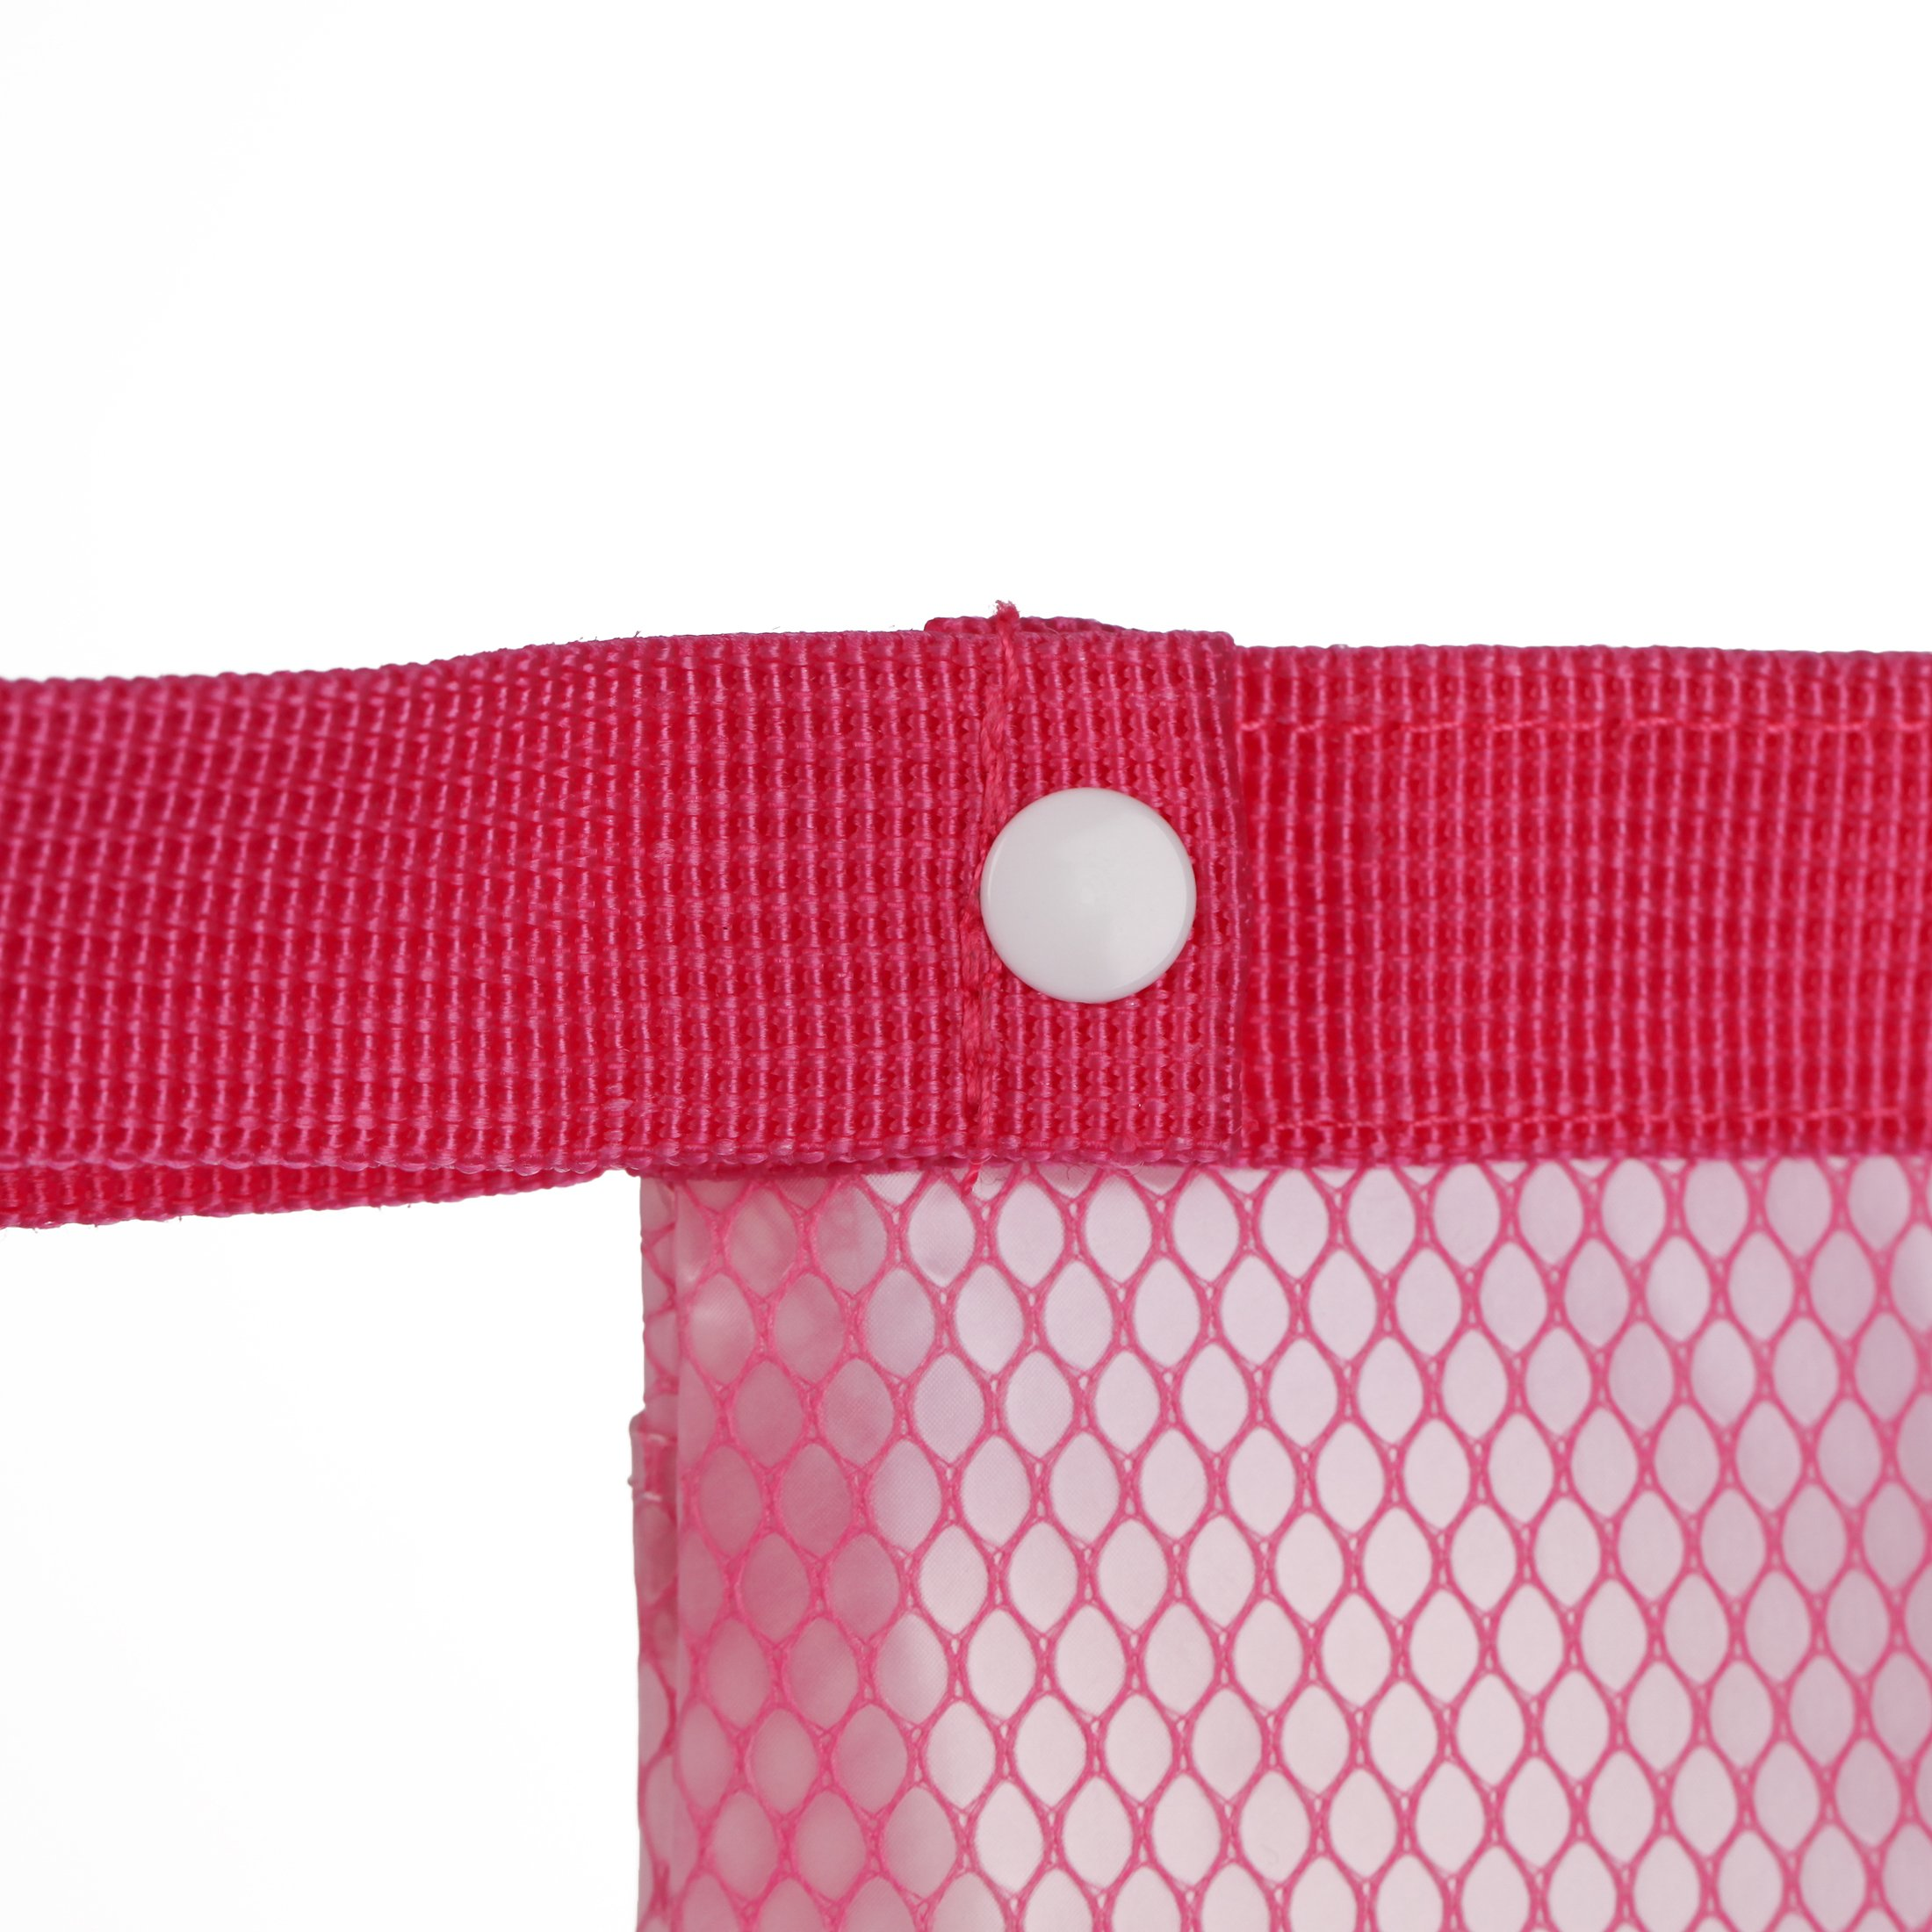 Ultrasport wasserfeste Tasche wasserabweisender Kulturbeutel L 27 cm B 21,5 cm